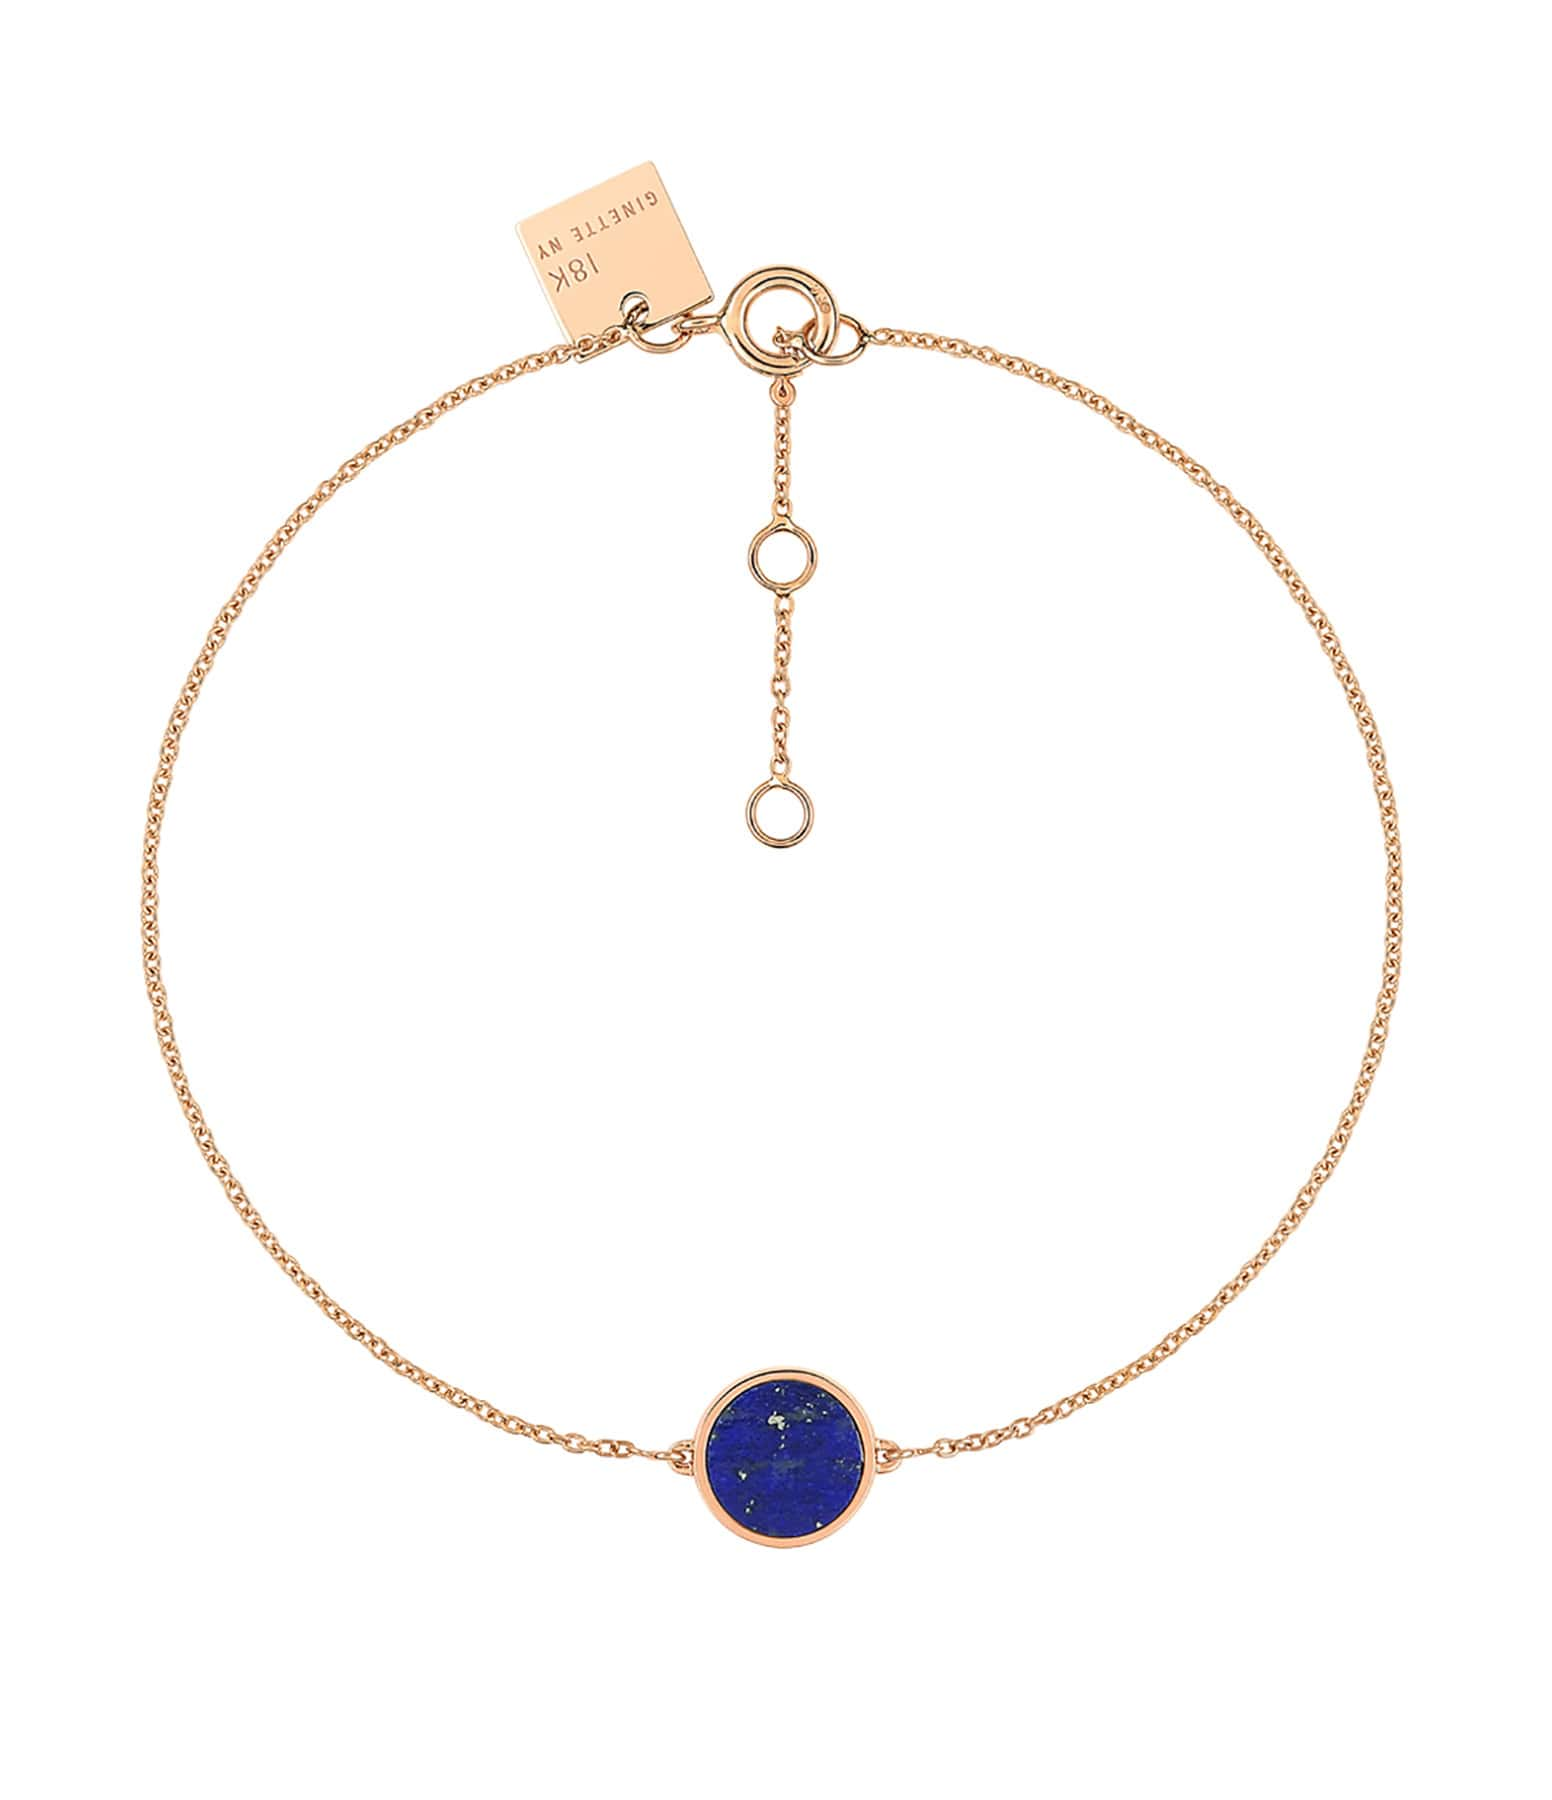 GINETTE NY - Bracelet Ever Mini Disc Or Rose Lapis Lazuli